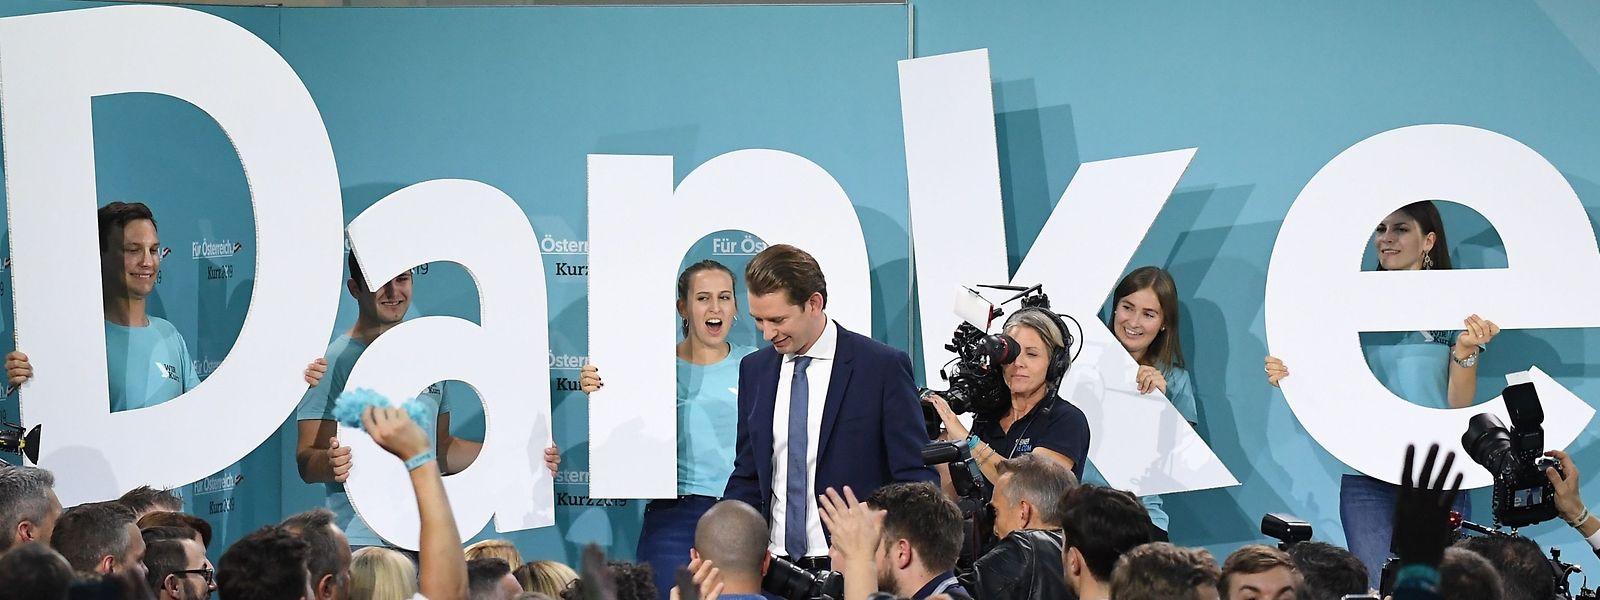 Sebastian Kurz nach seinem Wahlsieg am Sonntagabend.